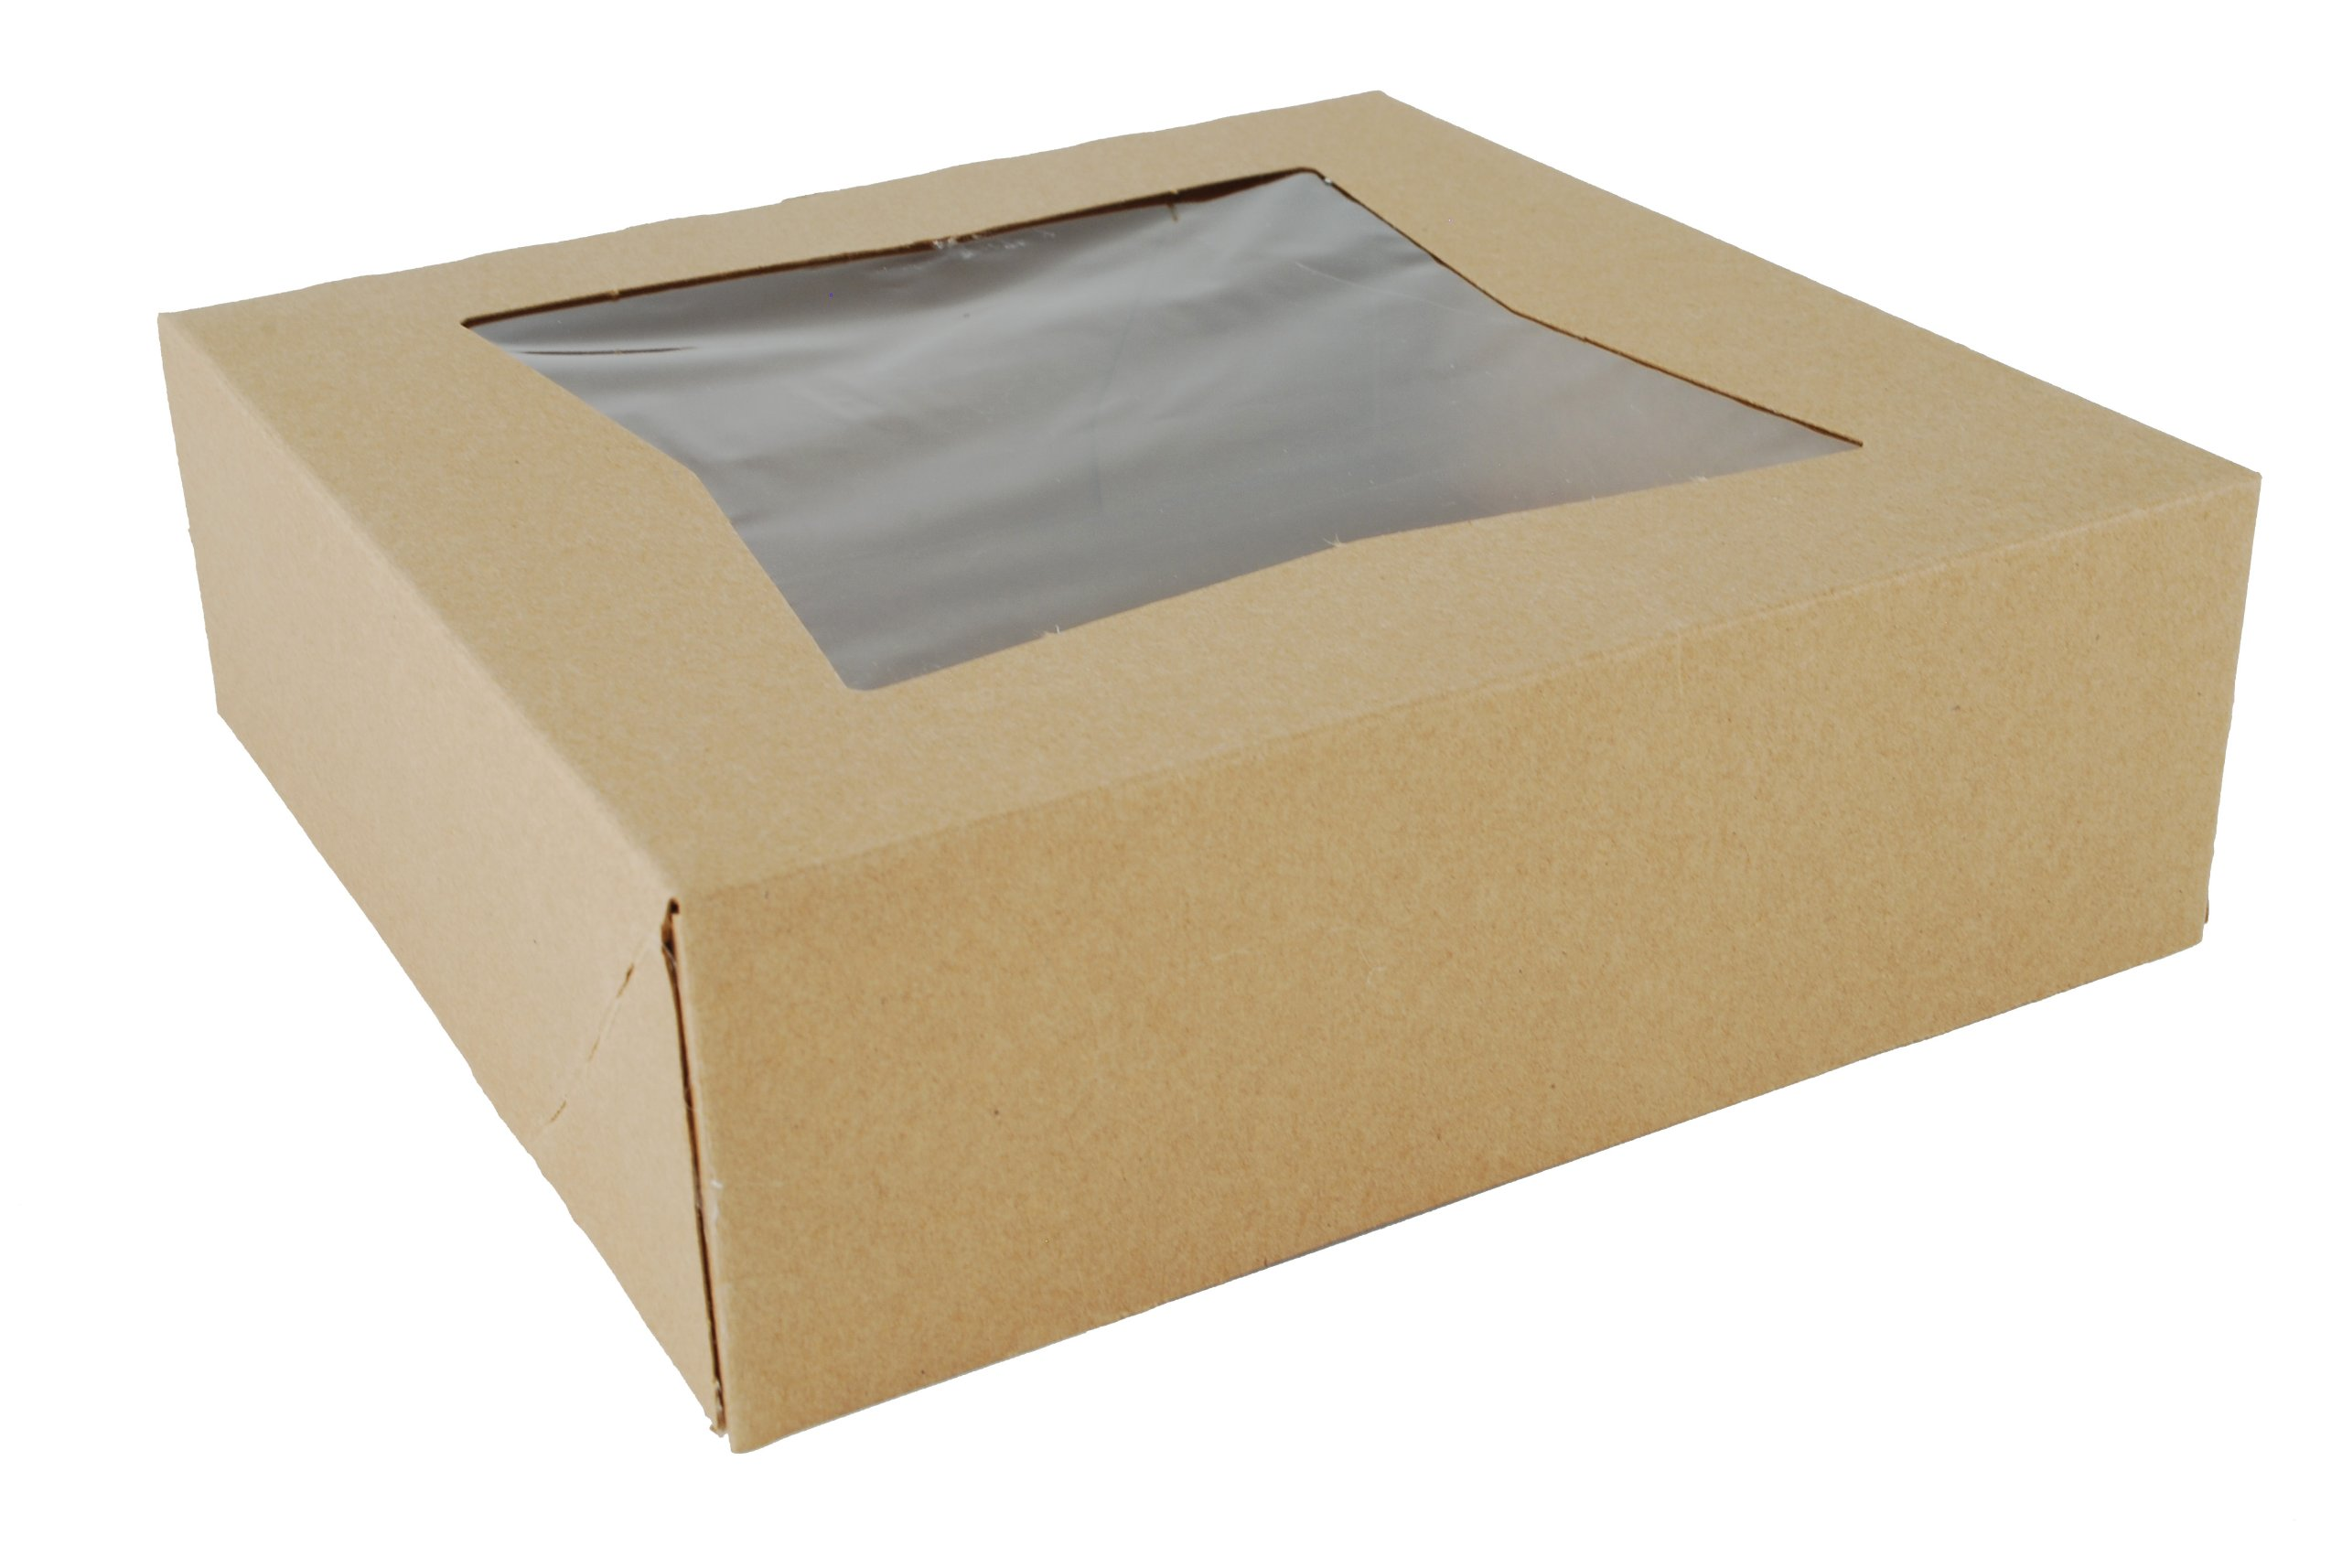 Southern Champion Tray 24013K Kraft Paperboard Window Bakery Box, 8'' Length x 8'' Width x 2-1/2'' Height (Case of 200)